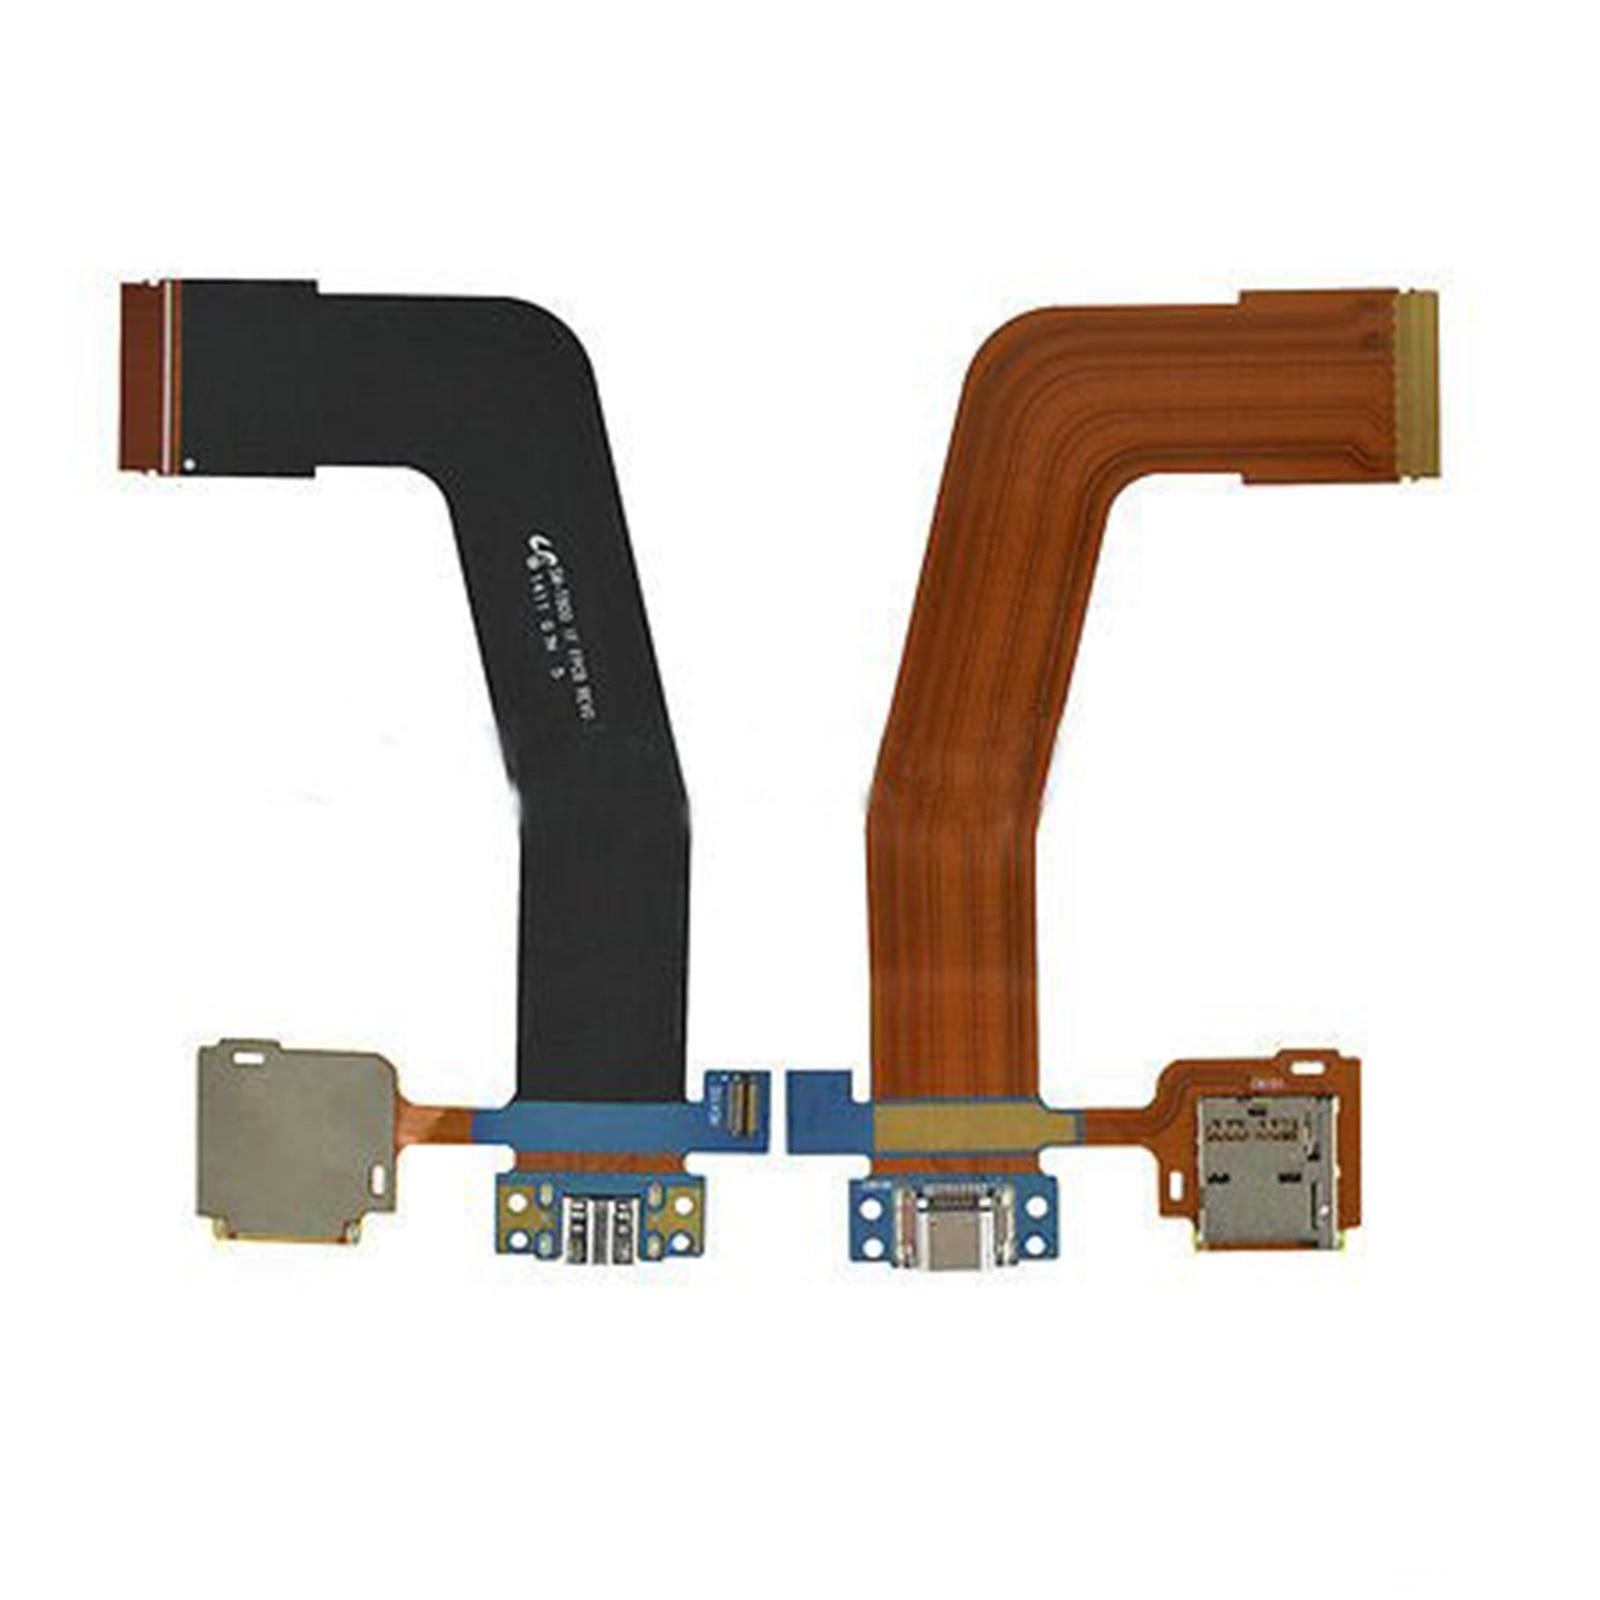 10 unids/lote Samsung Galaxy Tab P5100 P5200 P7100 P7300 P7500 P900 P550 T550 P600 T520 T530 T800 N8000 puerto de carga Flex Cable